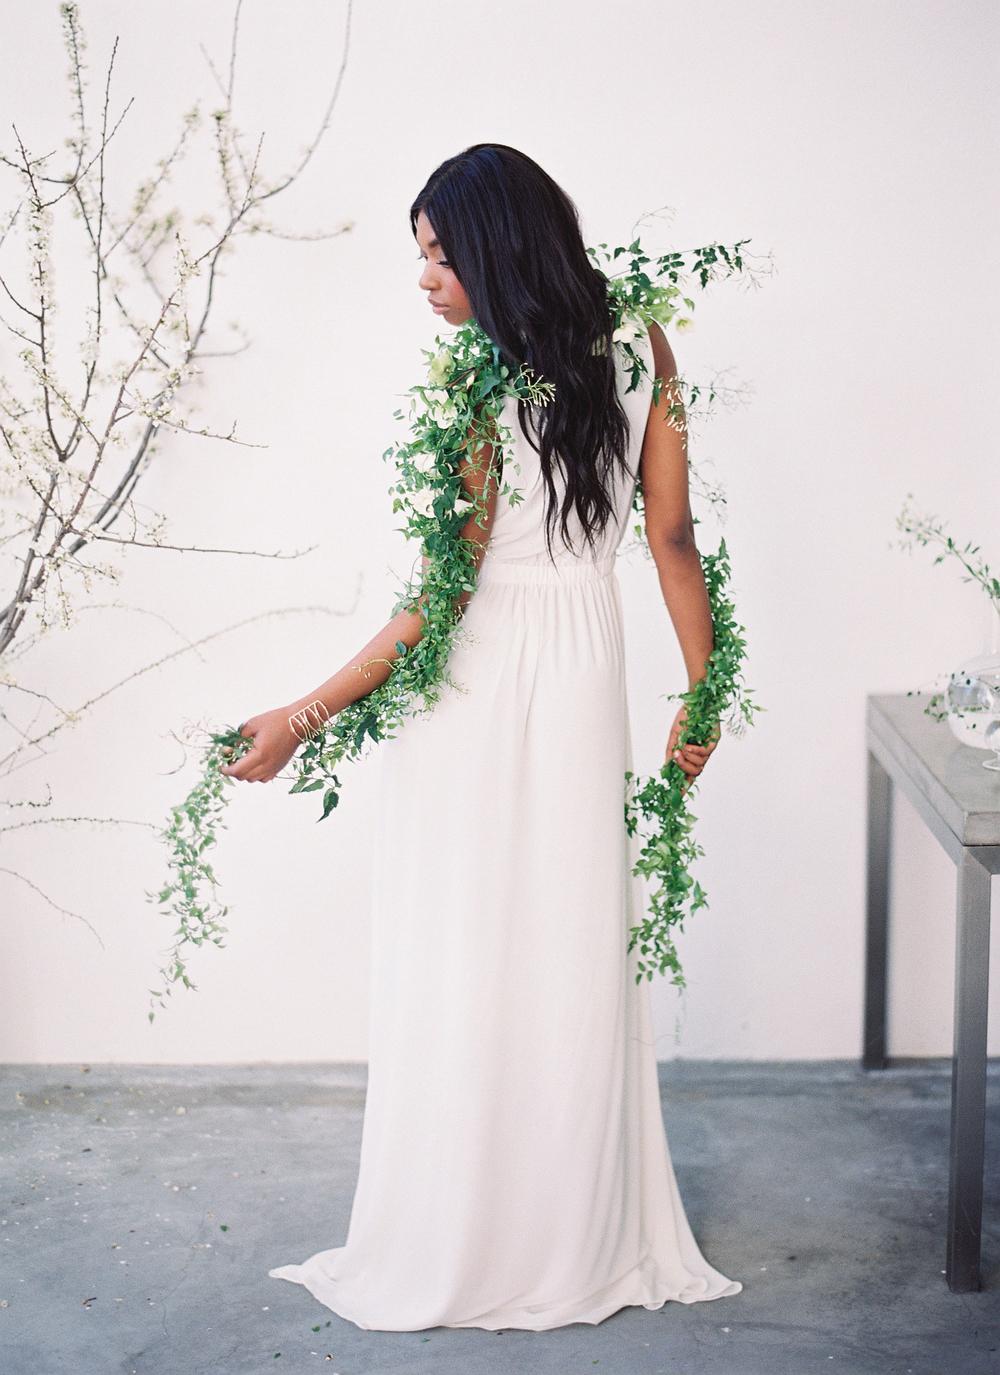 Floralessence-Esmeraldafranco-51.JPG